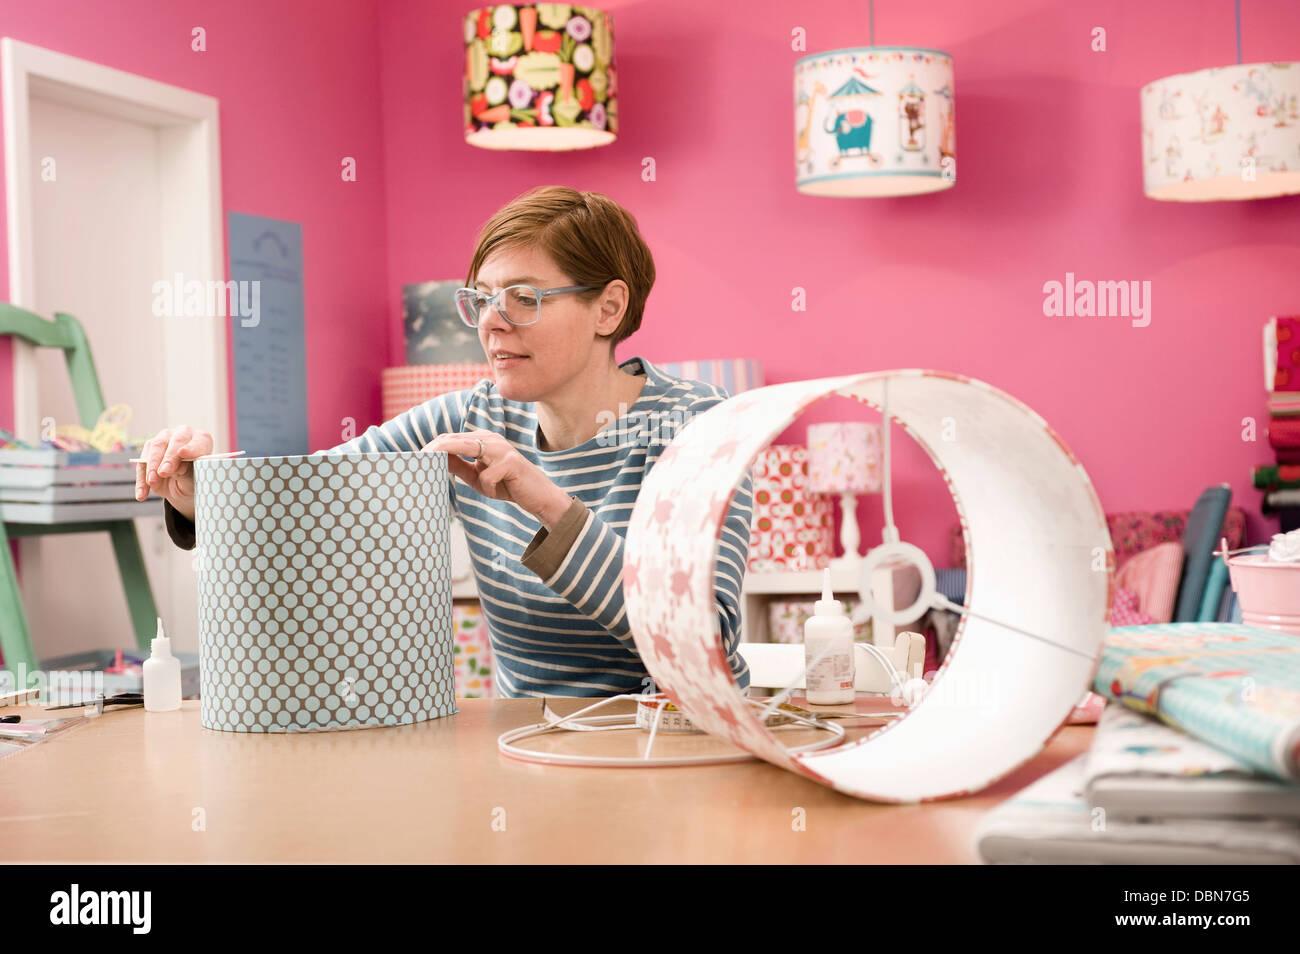 Making A Custom Lampshade, Munich, Bavaria, Germany, Europe - Stock Image